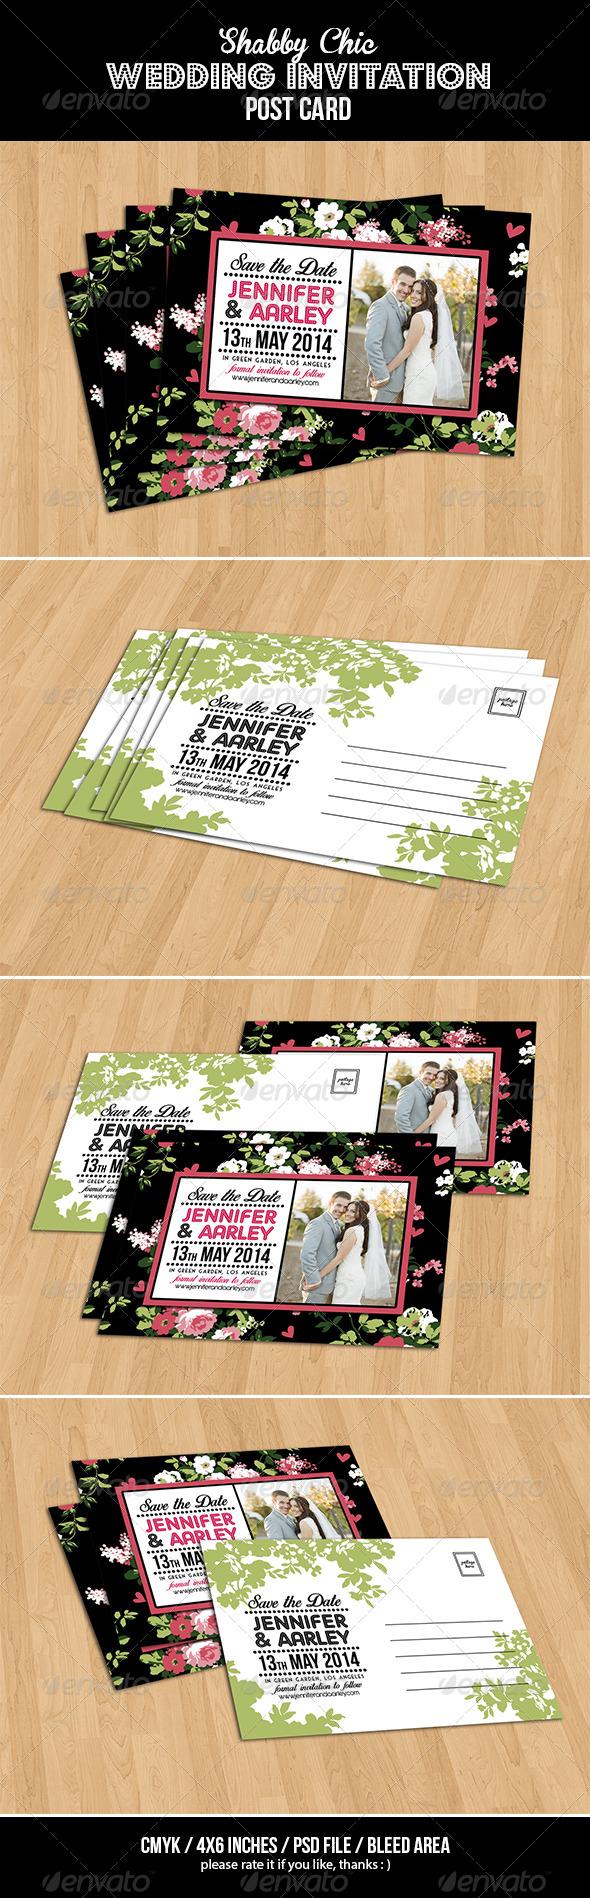 GraphicRiver Shabby Chic Wedding Invitation Post Card Vol.3 7104808